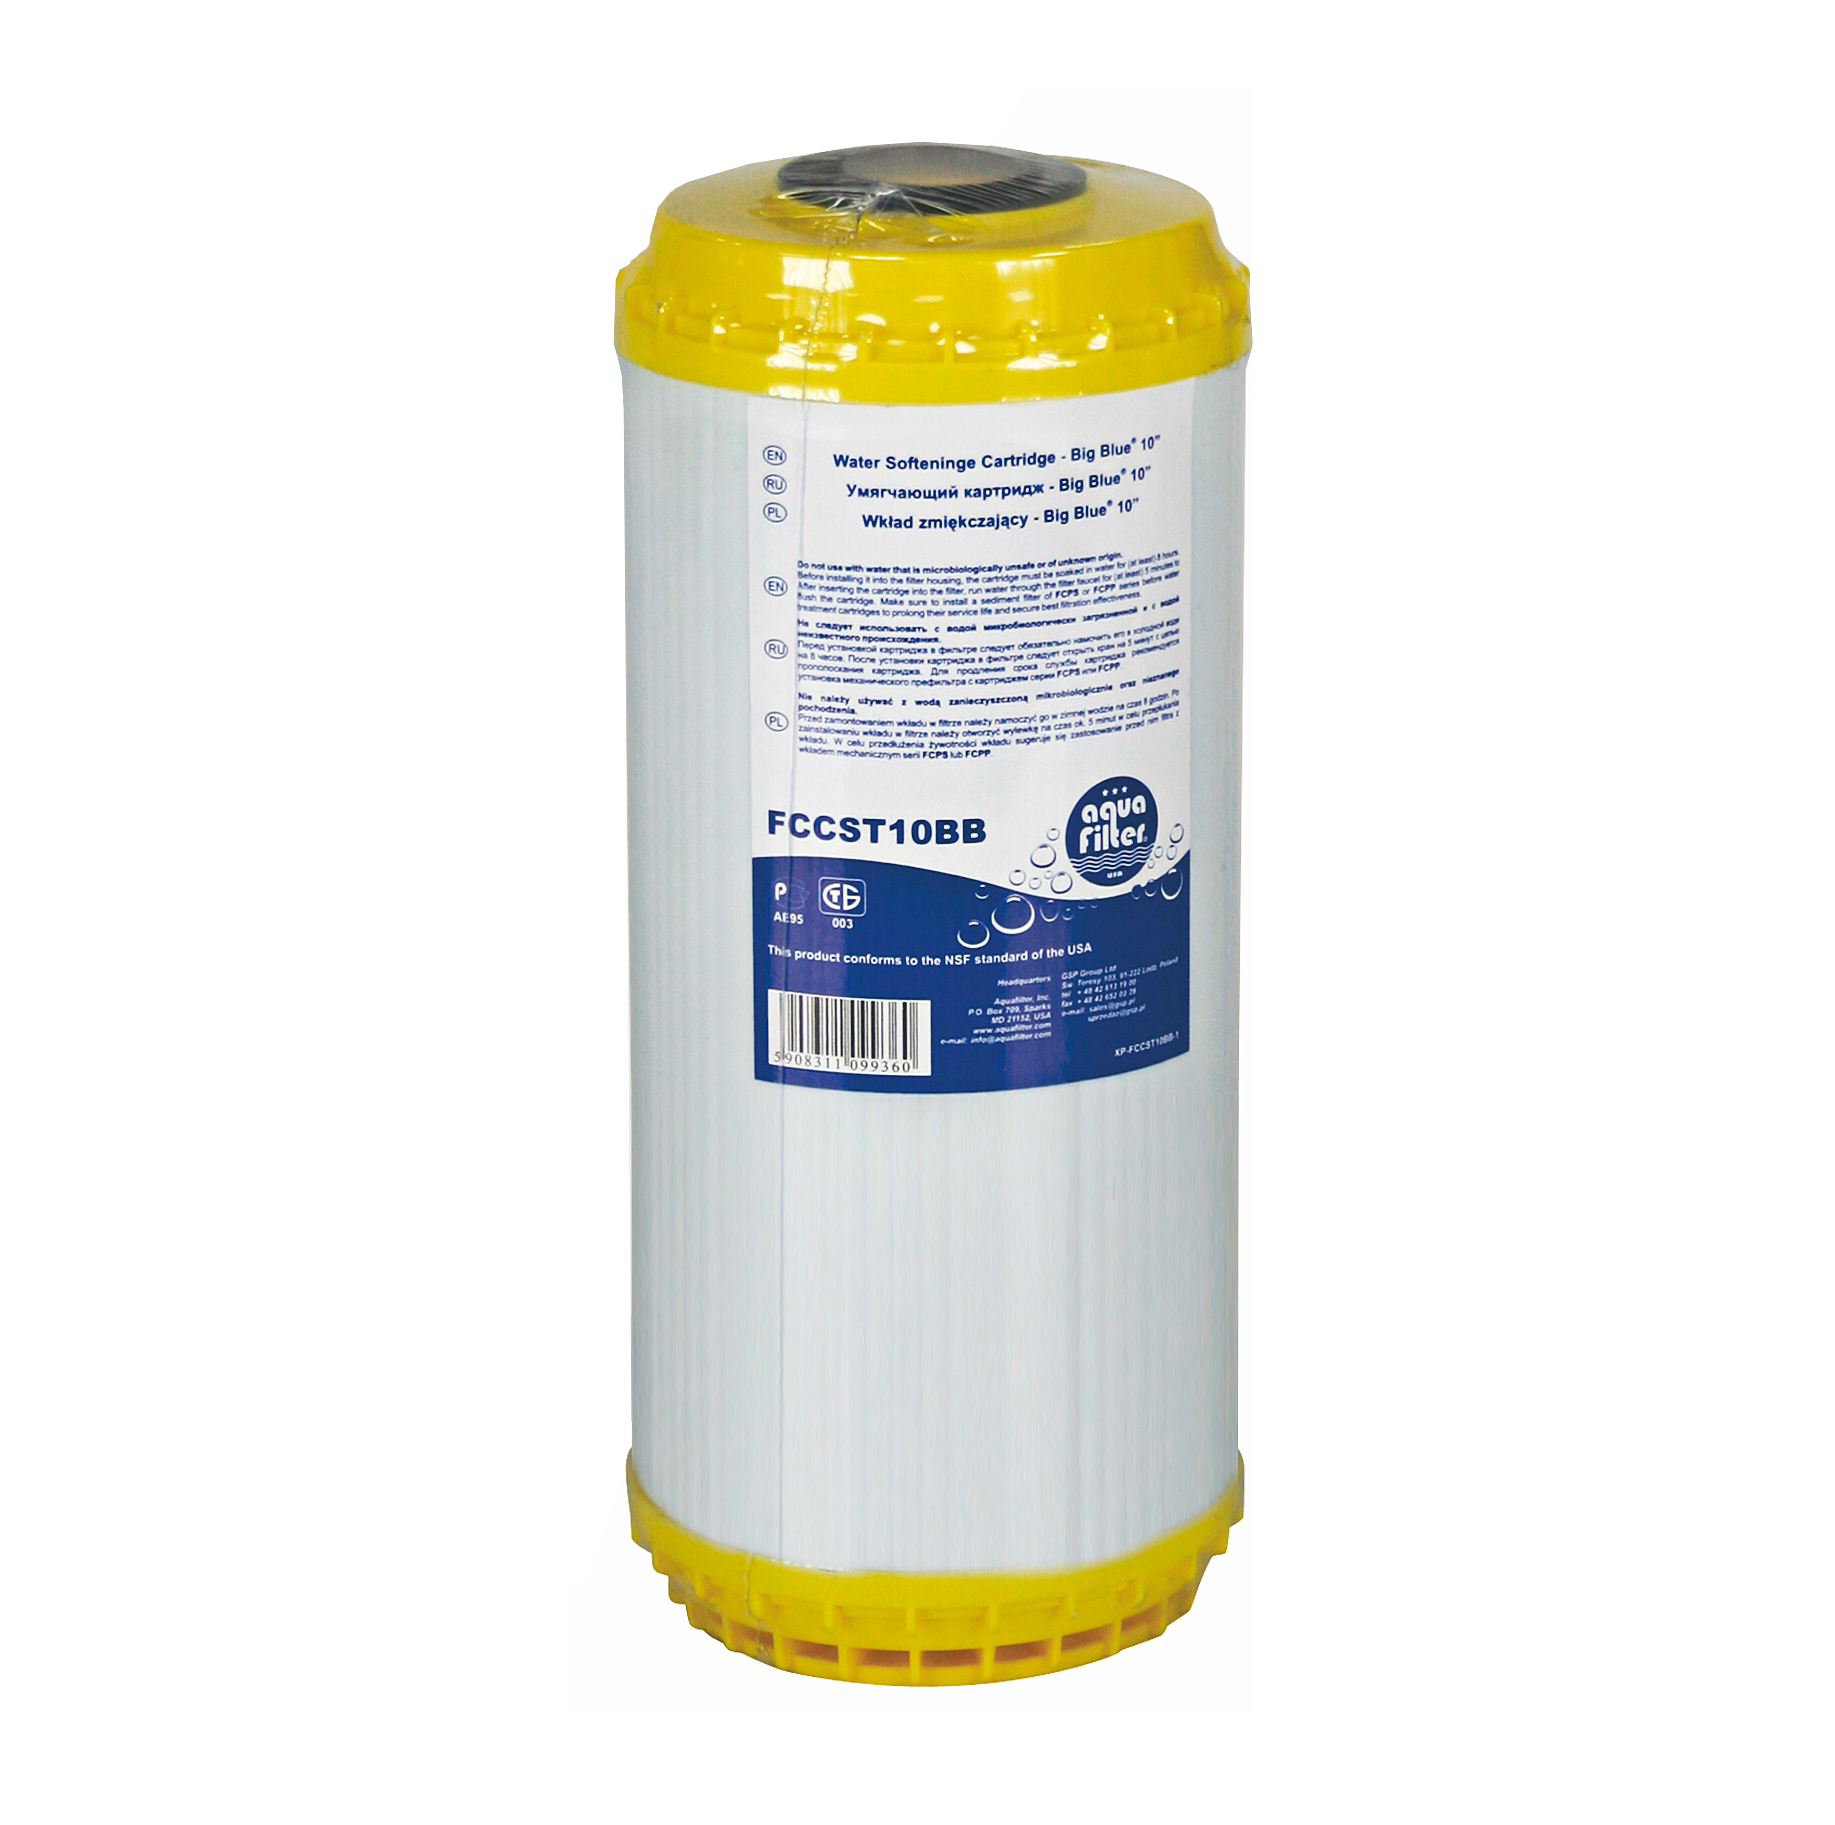 Картридж Aquafilter Fccst10bb aquafilter aqm картридж 10bb для умягчения воды fccst10bb